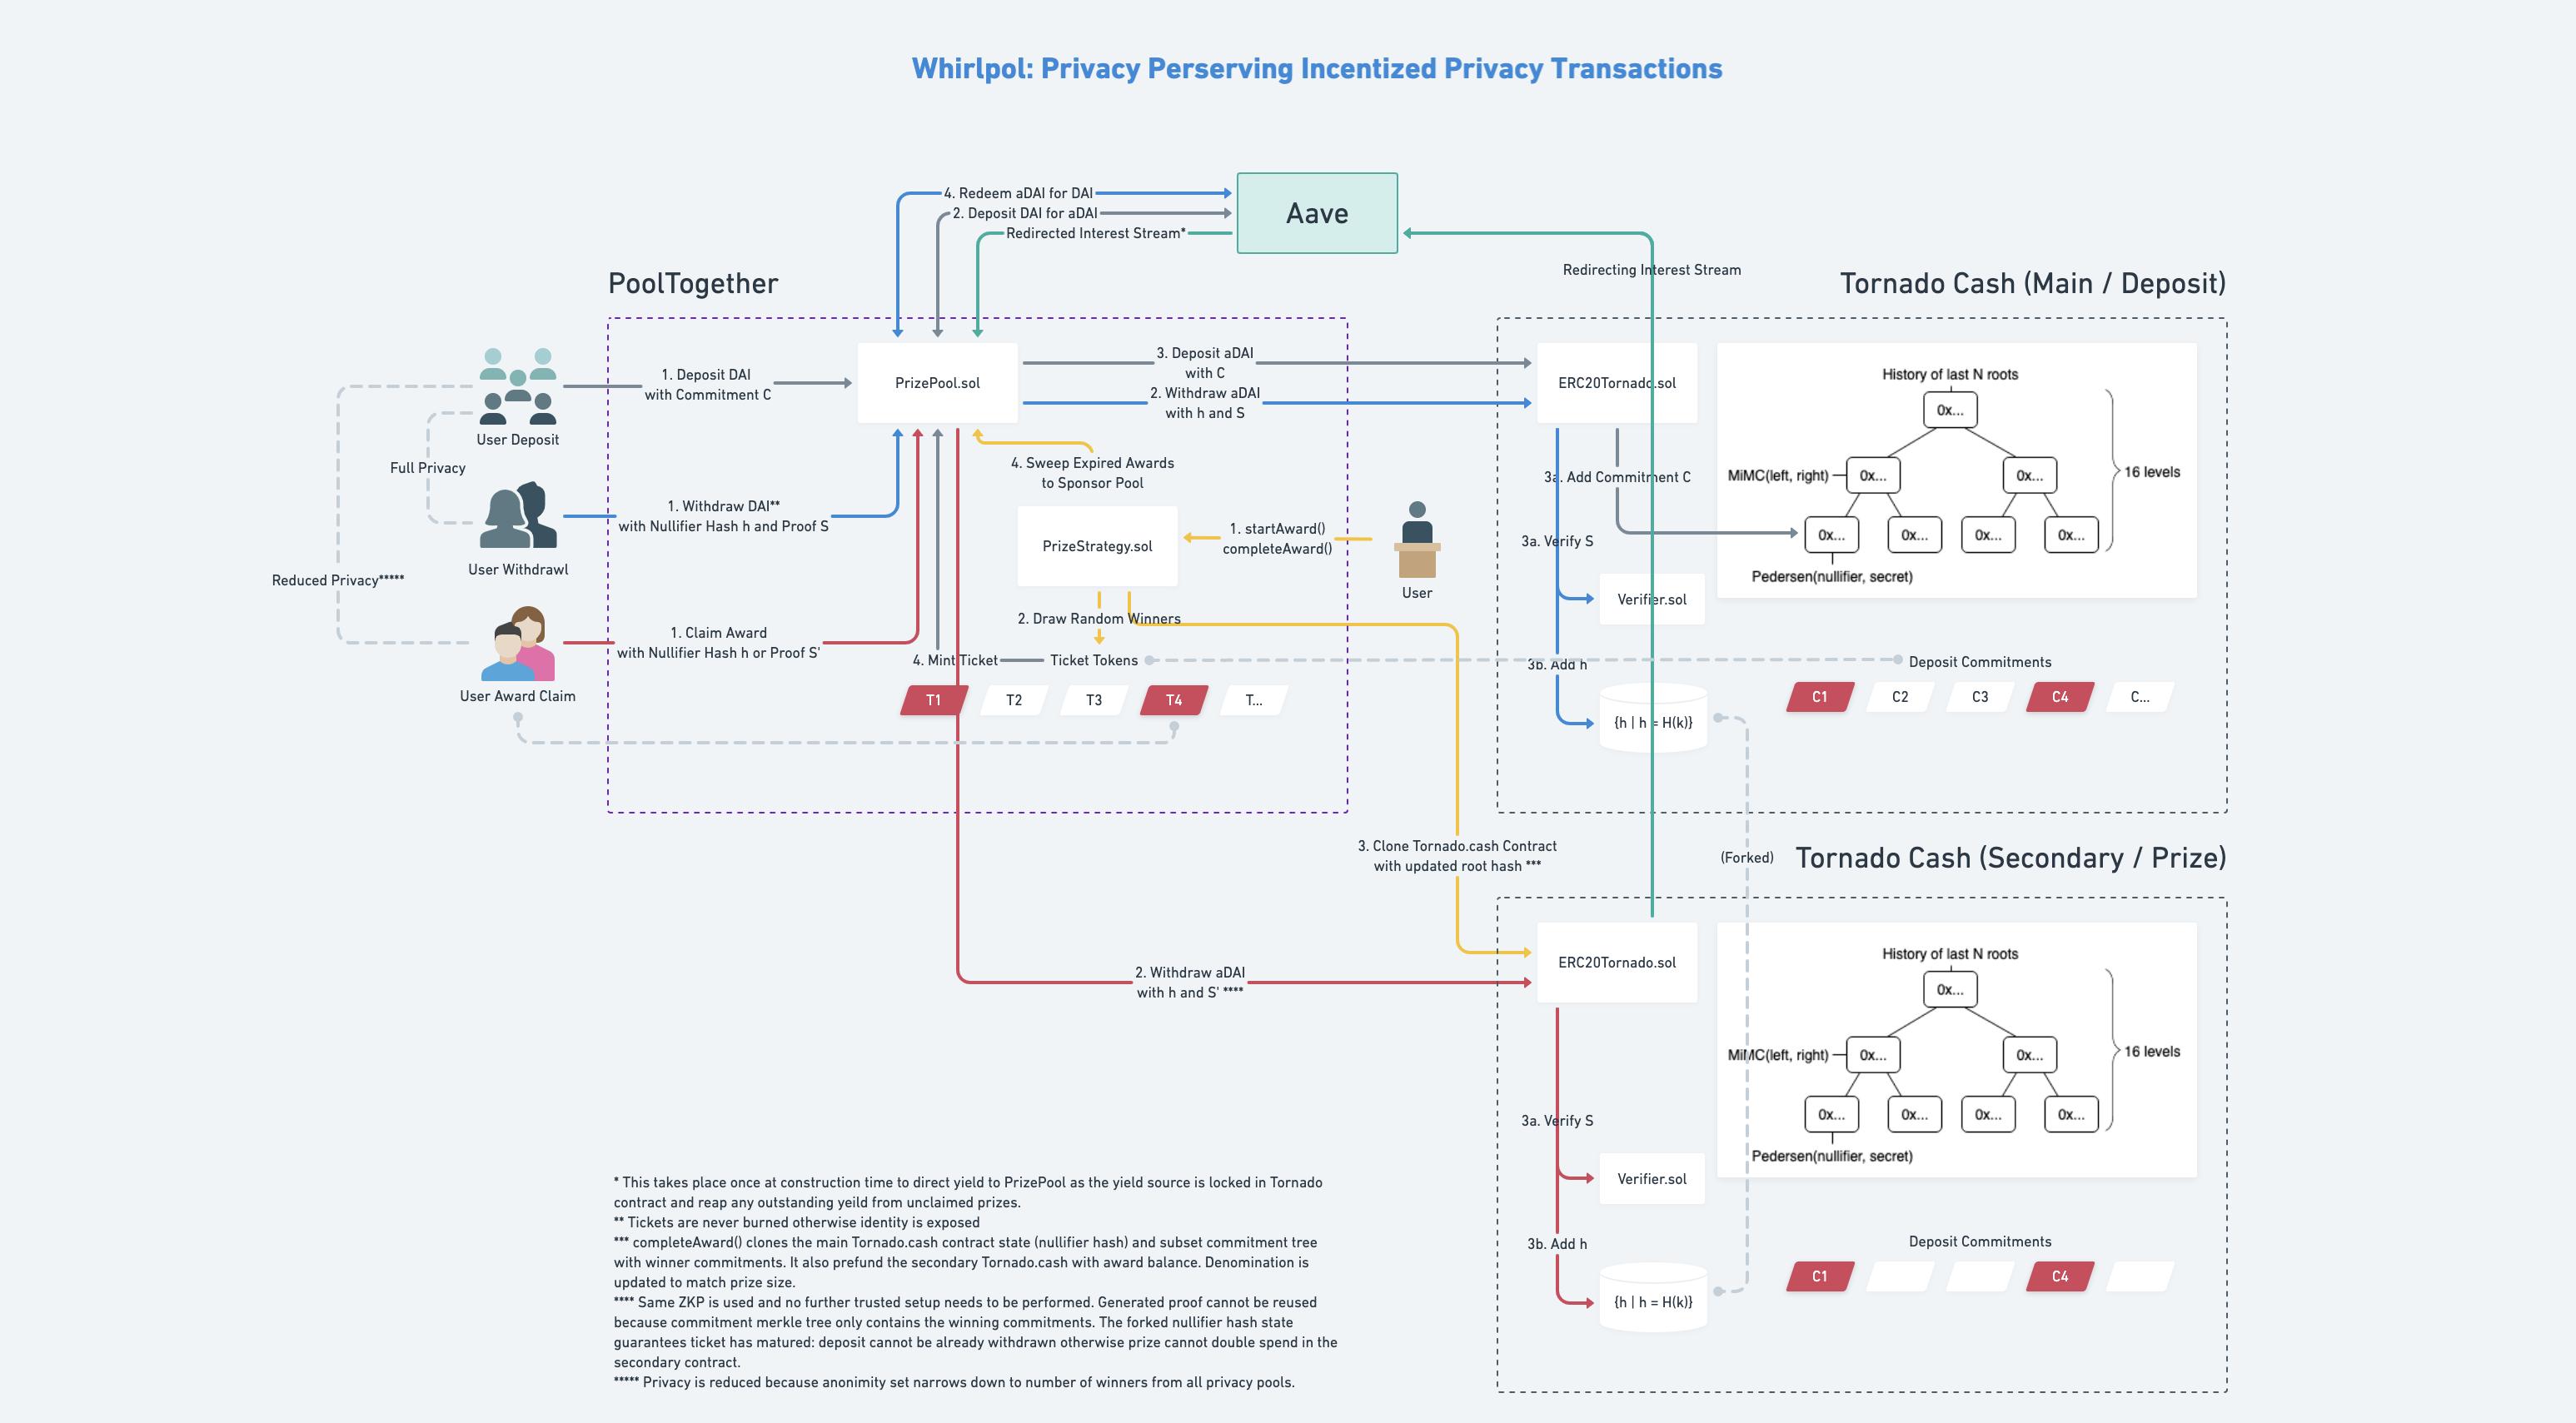 https://ethglobal.s3.amazonaws.com/recu93IVJ4DBGsnmr/diagram.png